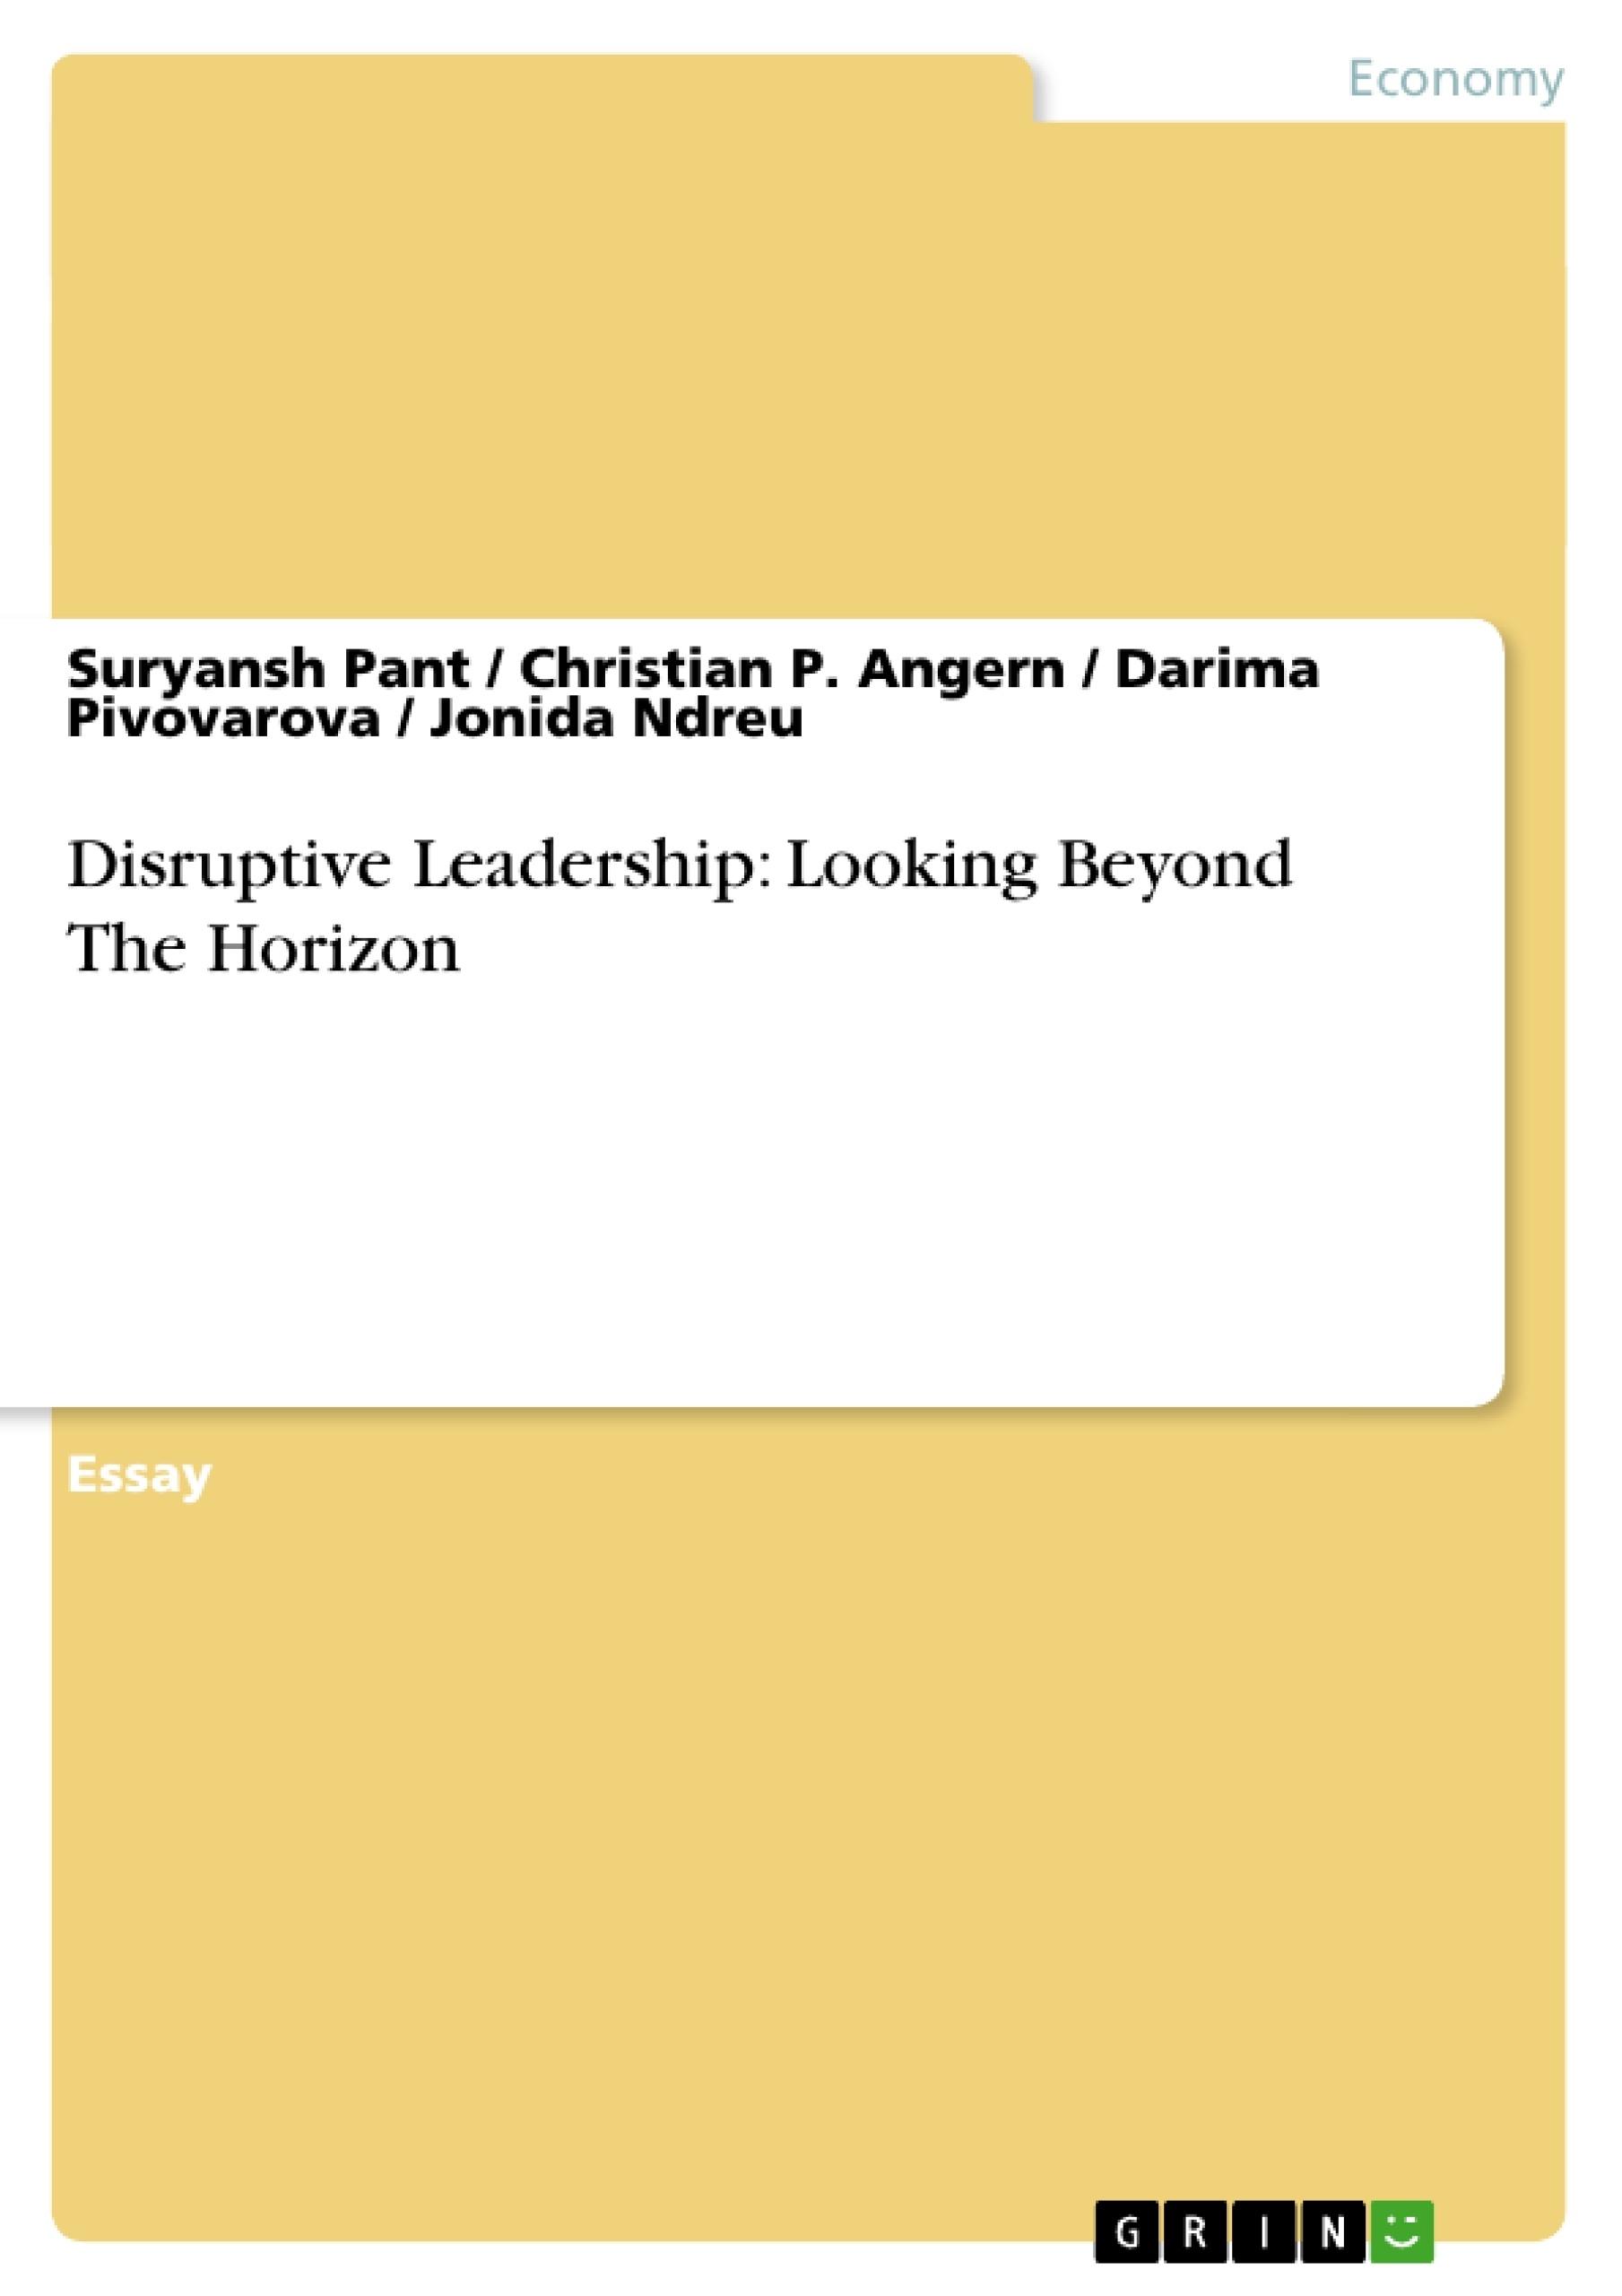 Title: Disruptive Leadership: Looking Beyond The Horizon